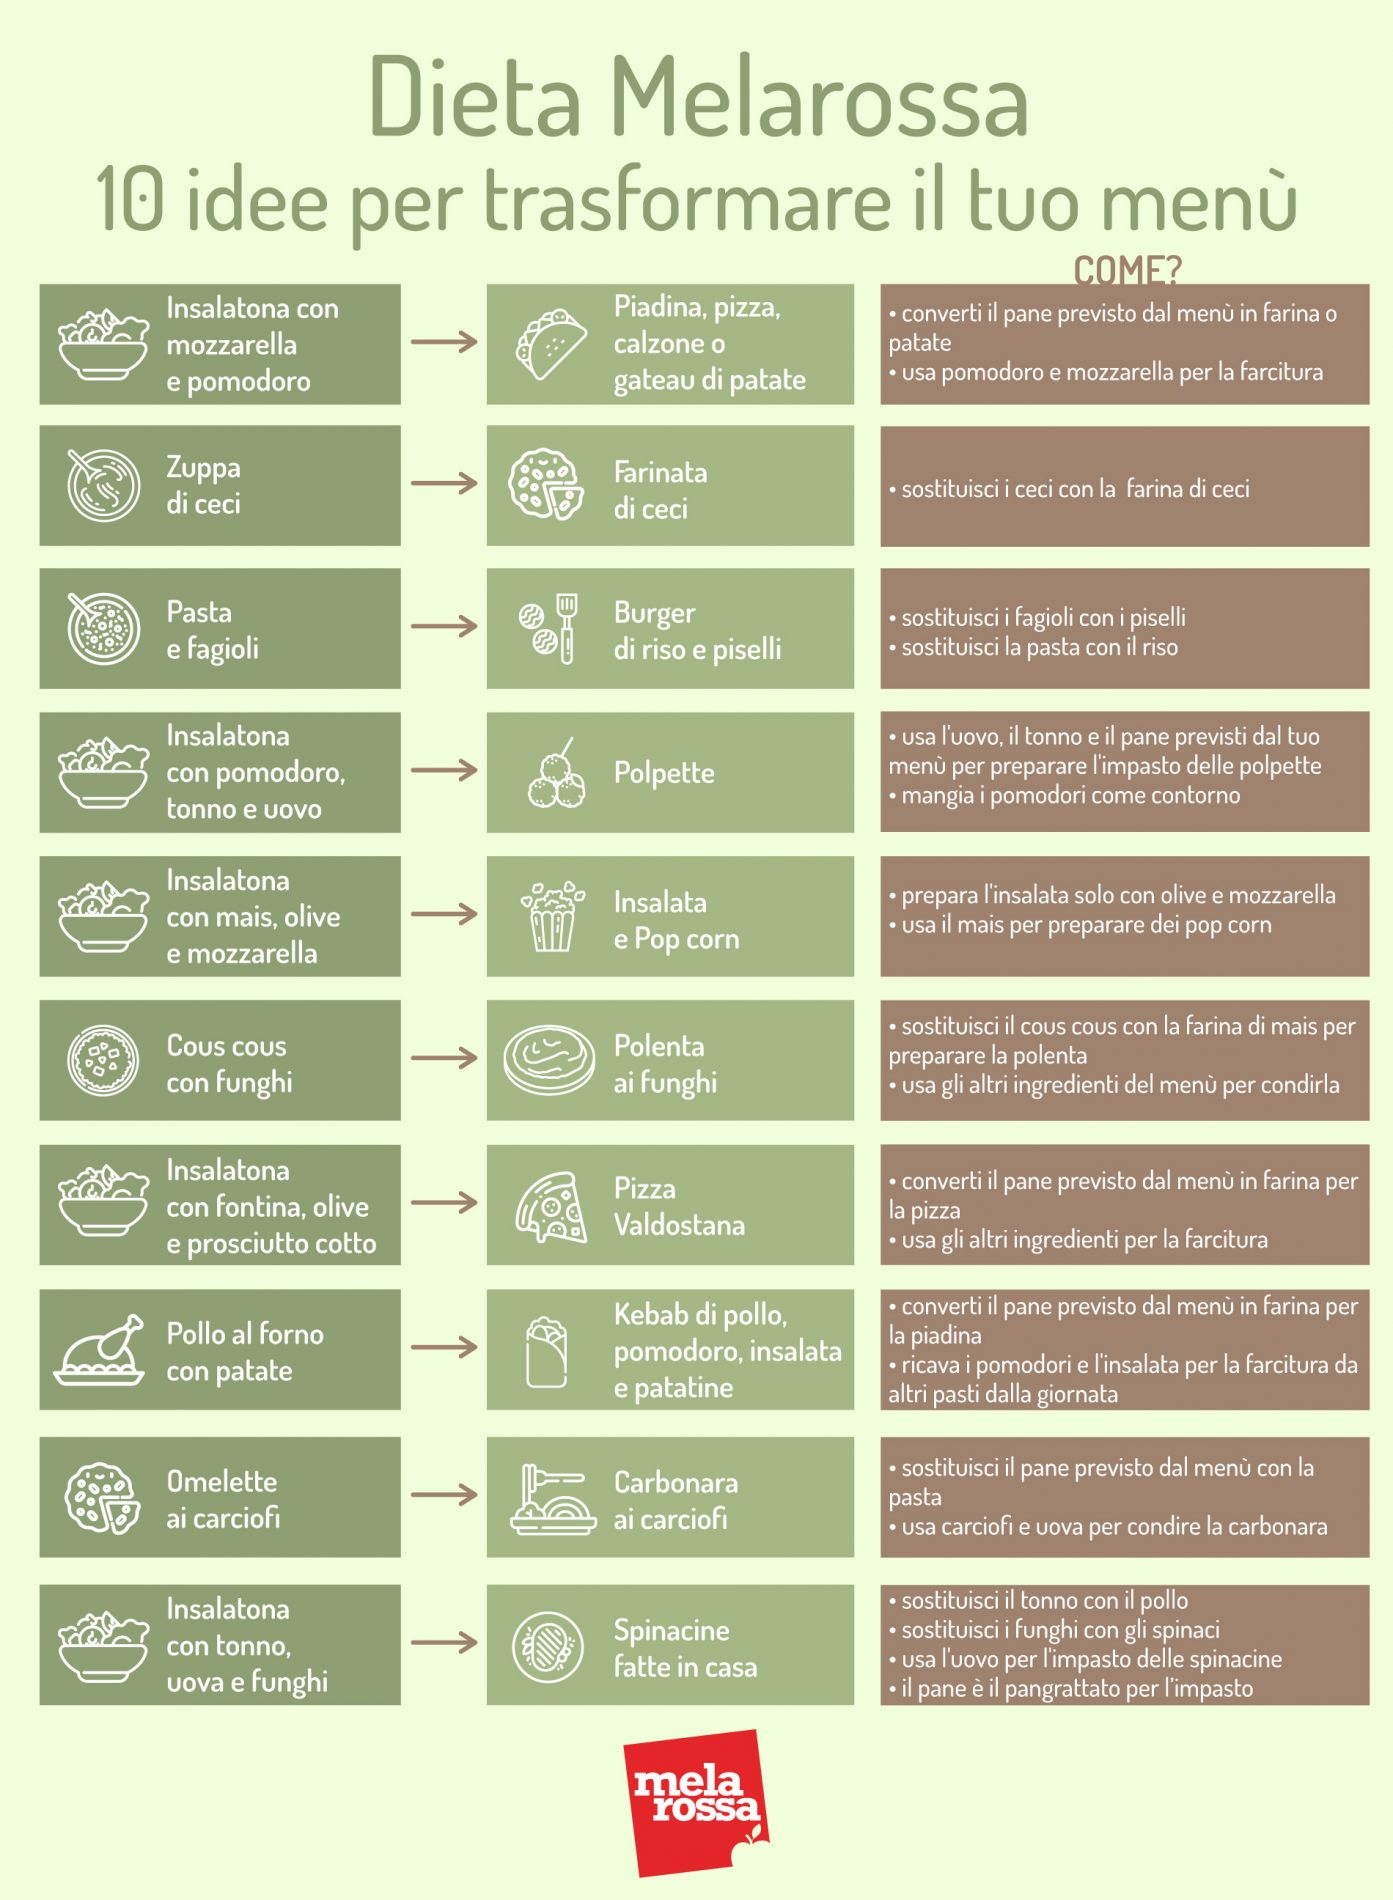 dieta melarossa 10 idee per trasformare piatti menù